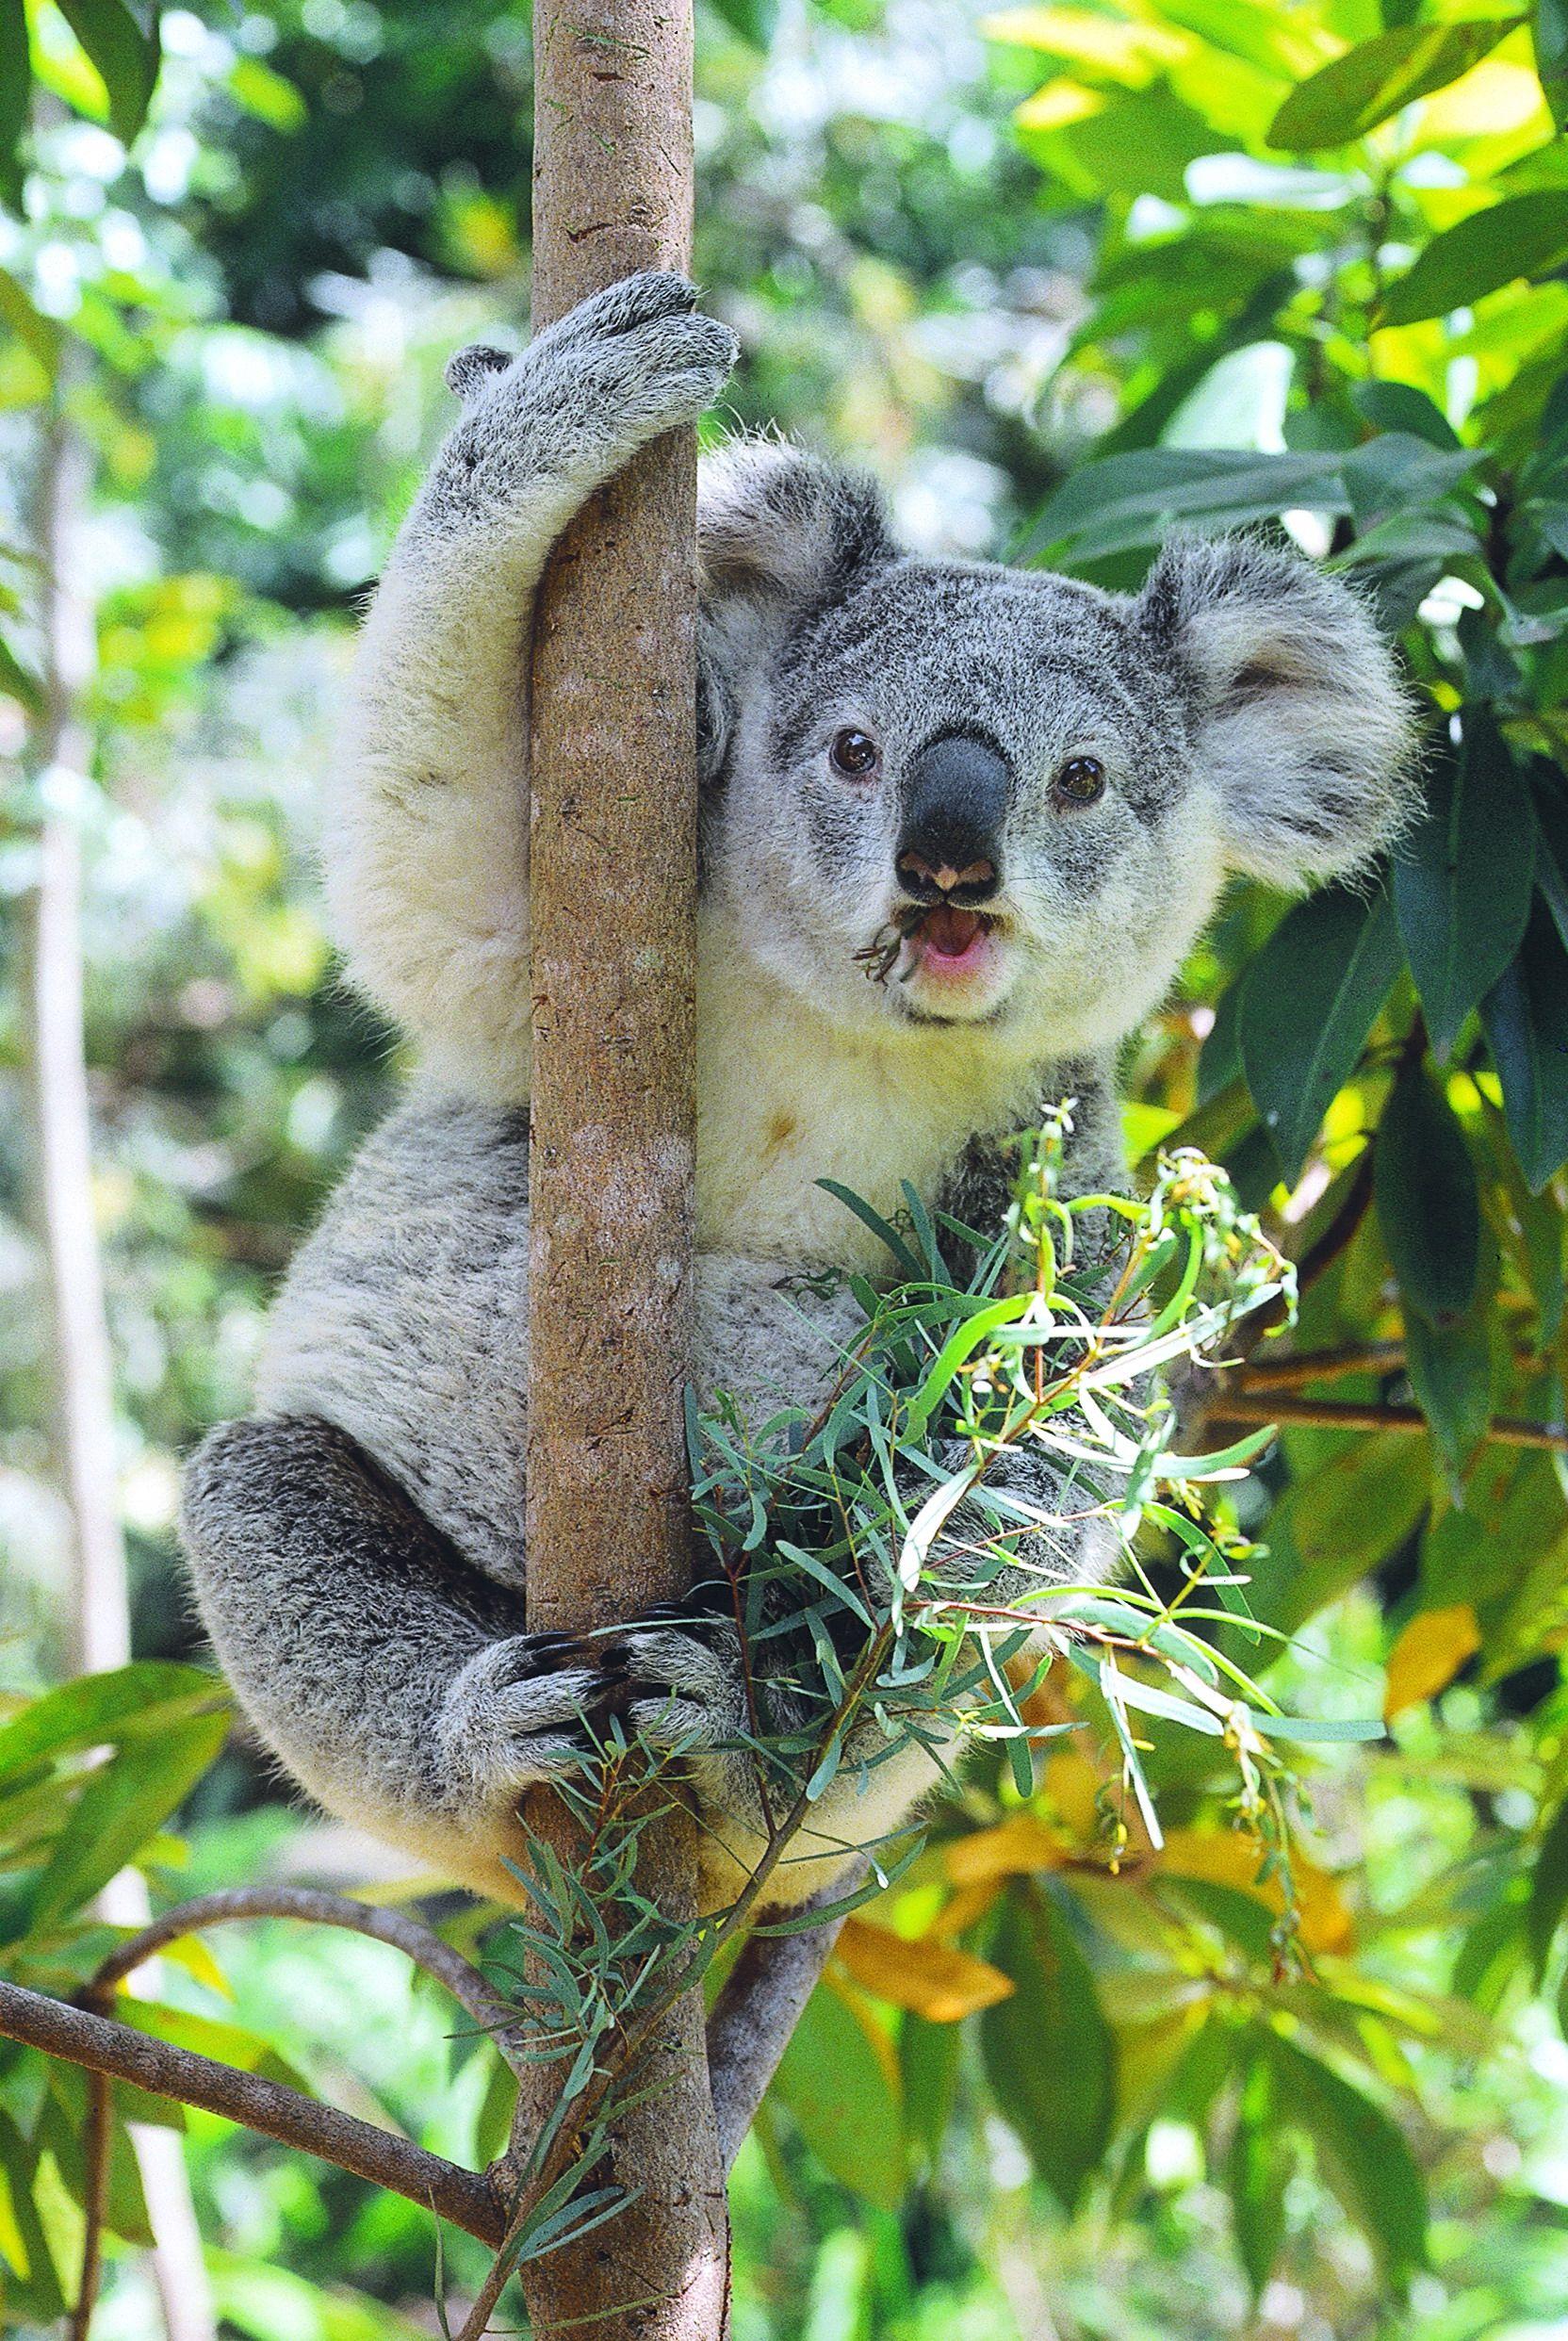 Lone pine koala sanctuary brisbane australia one of the